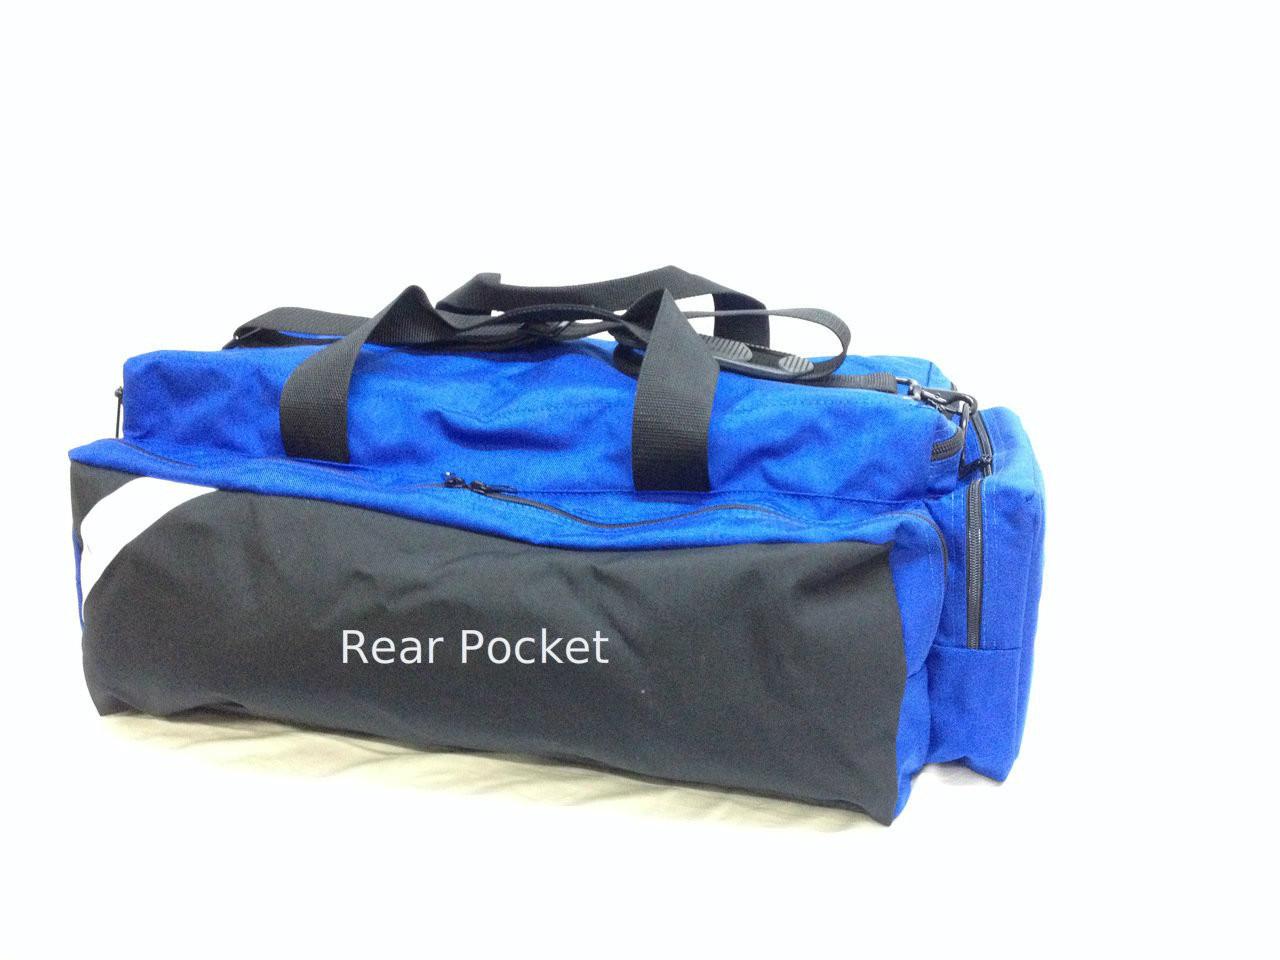 Dual Front Pocket Airpack - Rear Pocket